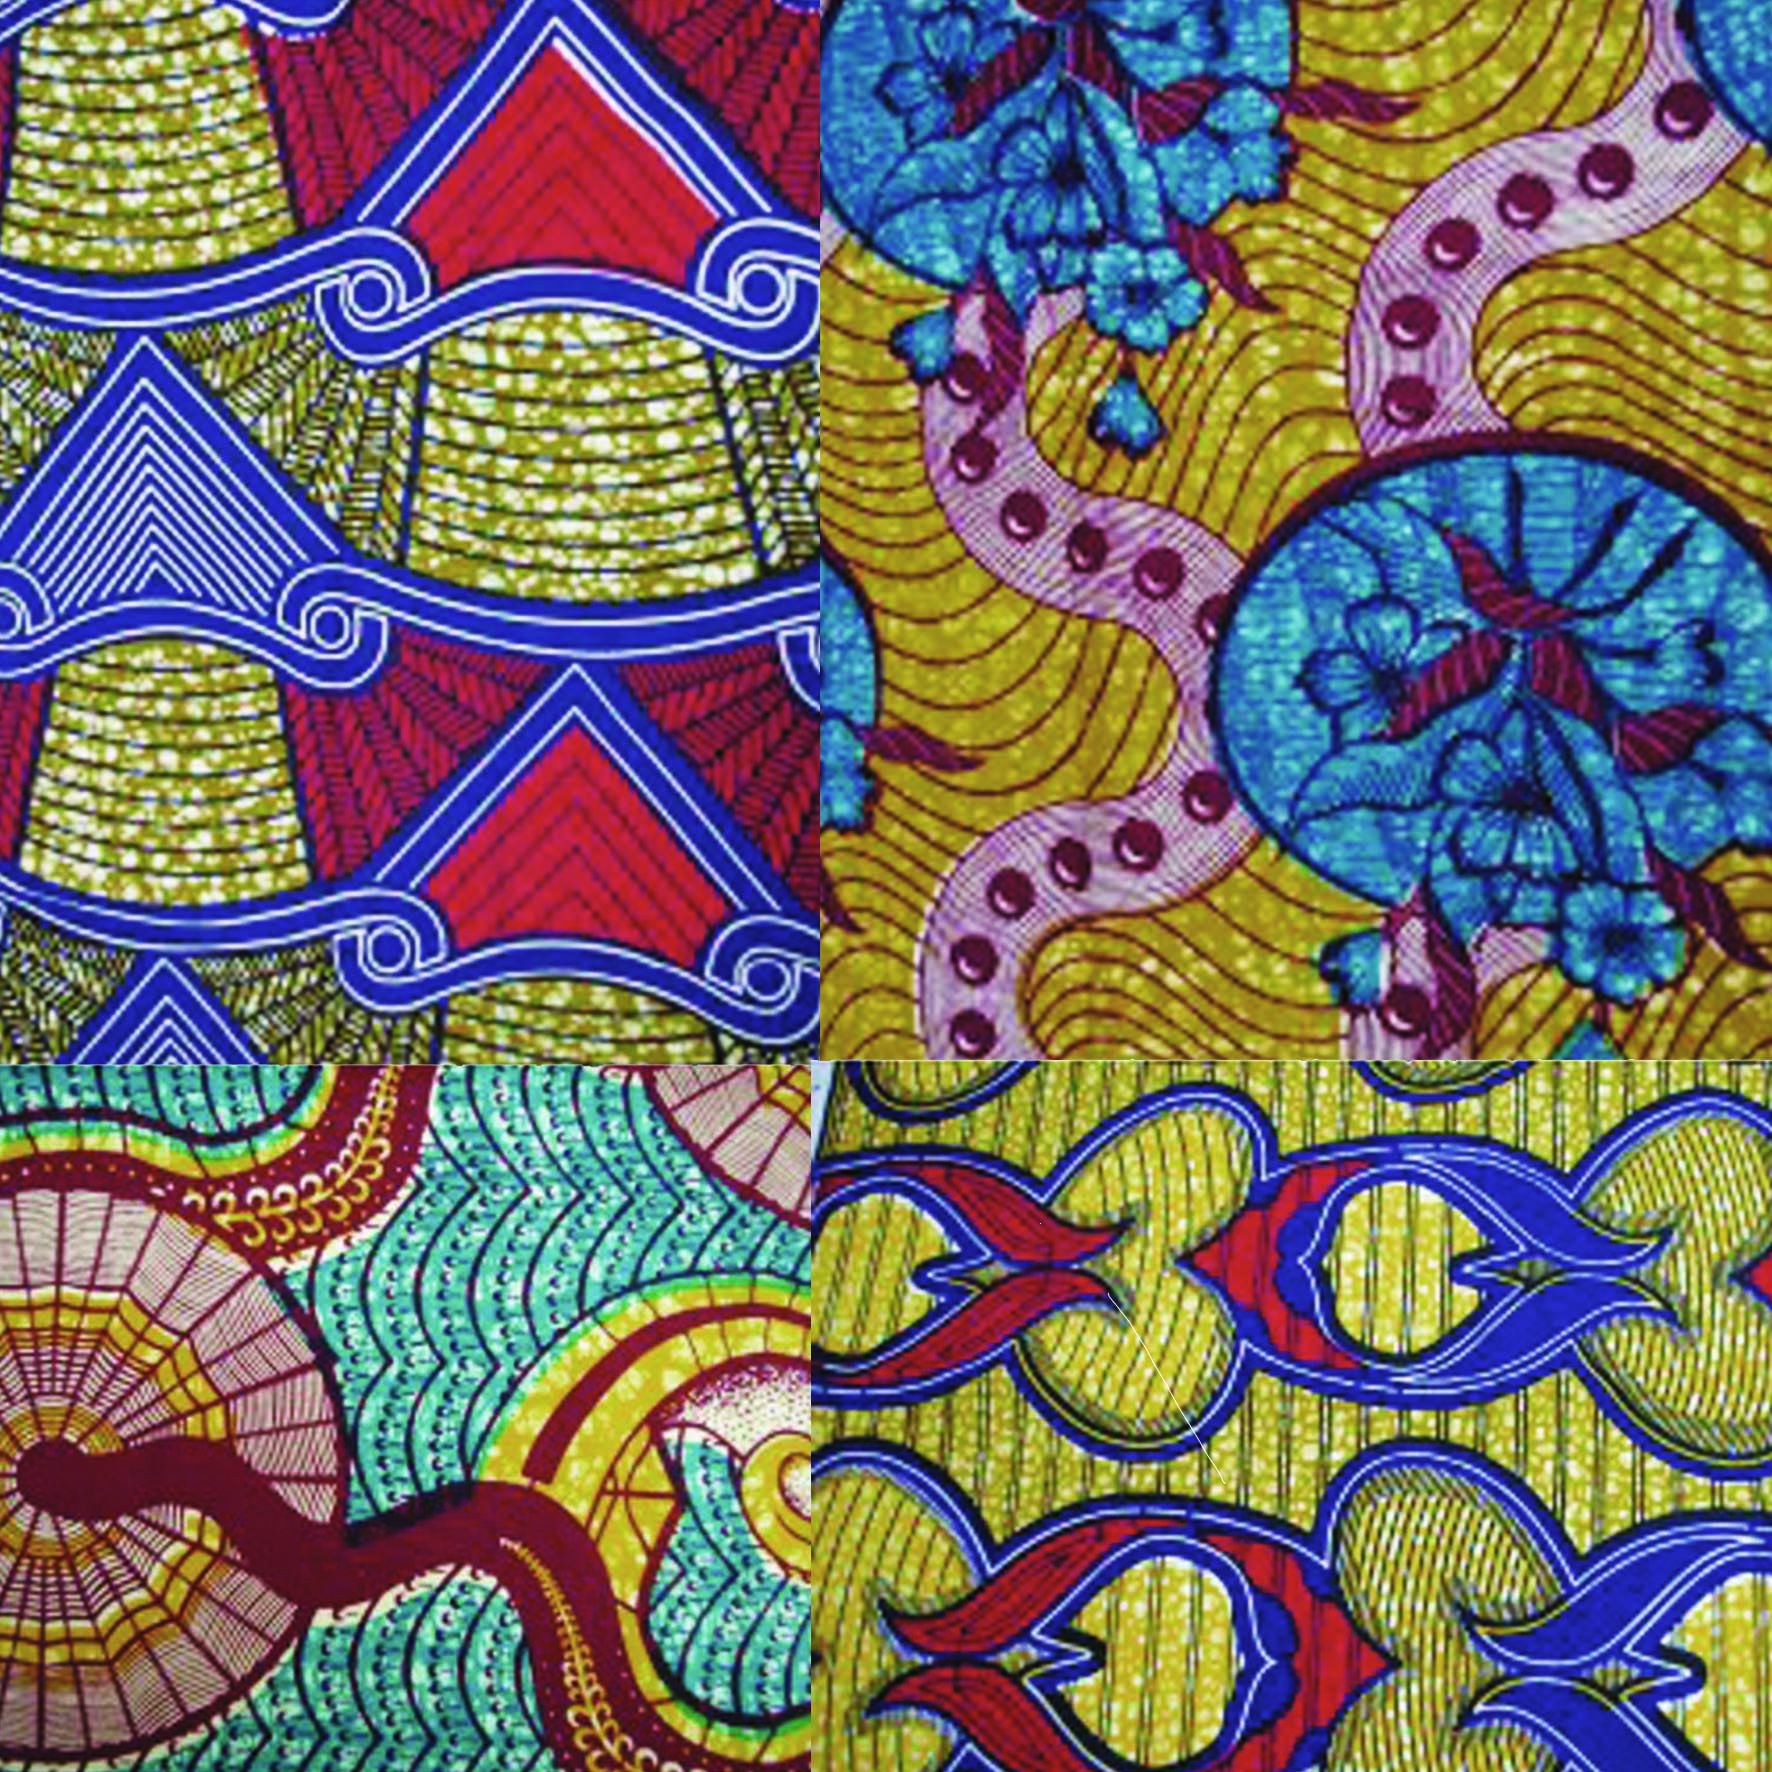 tissu africain sur paris